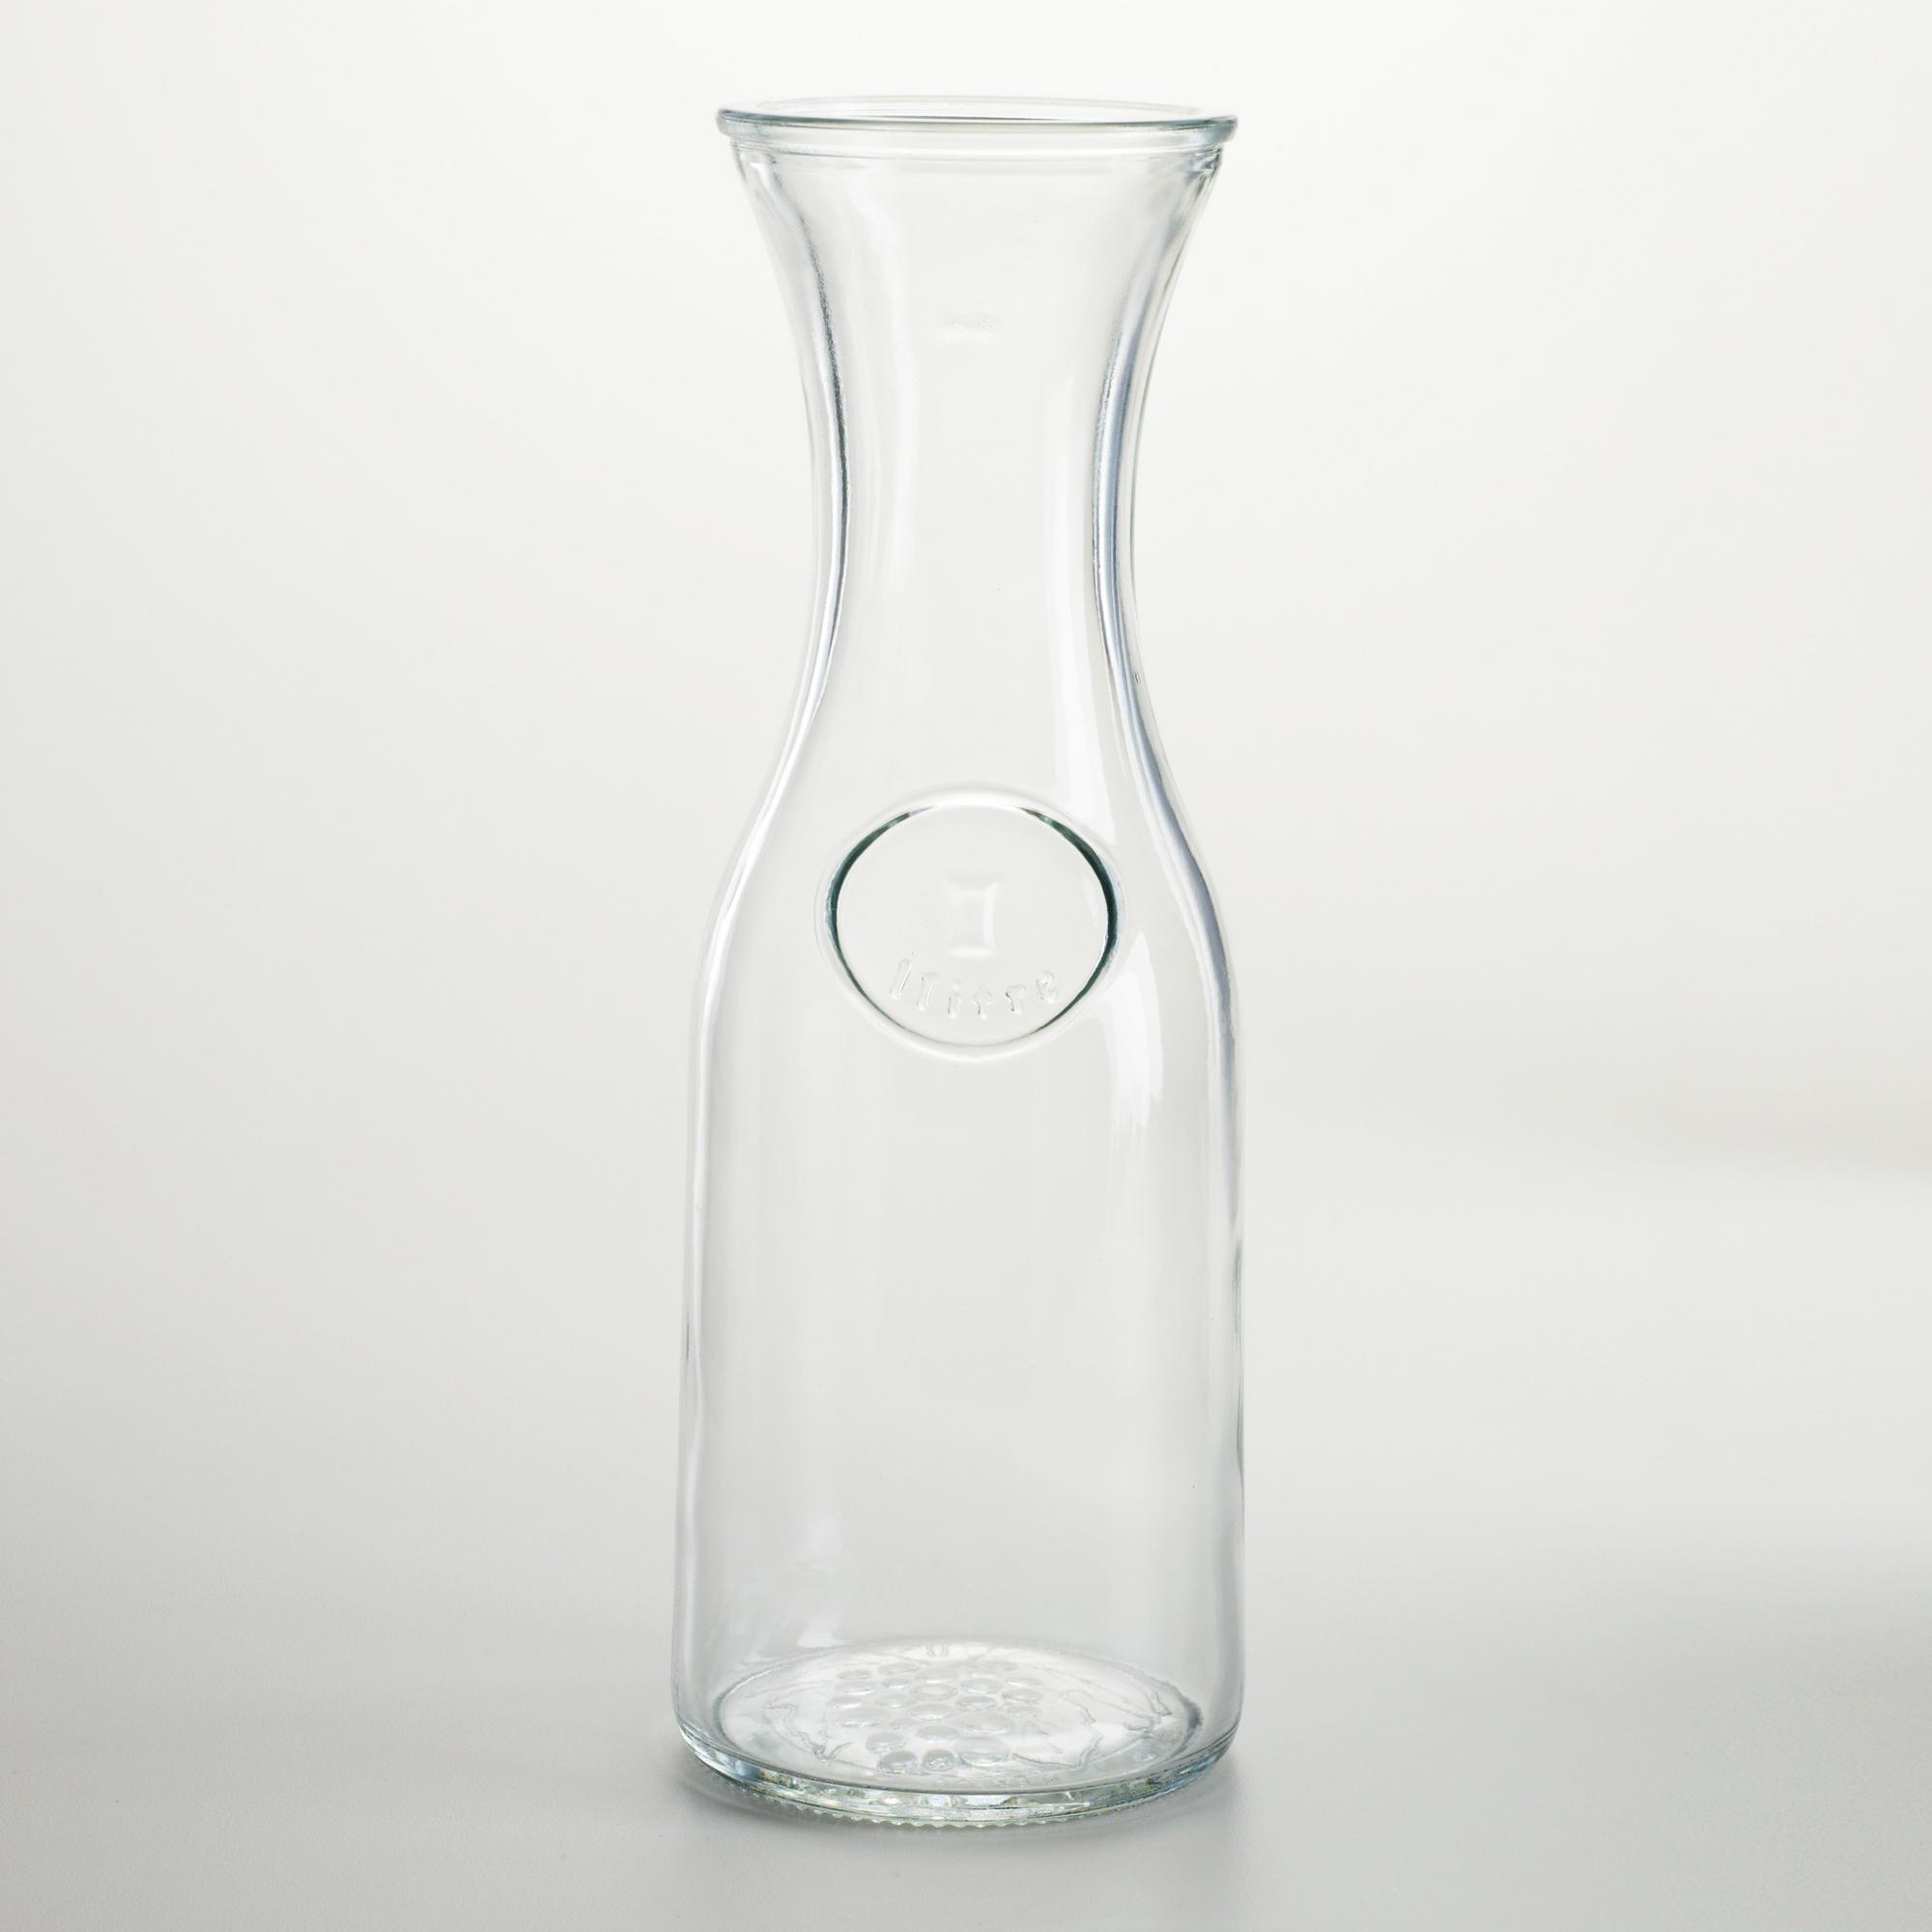 Pitcher glass carafe